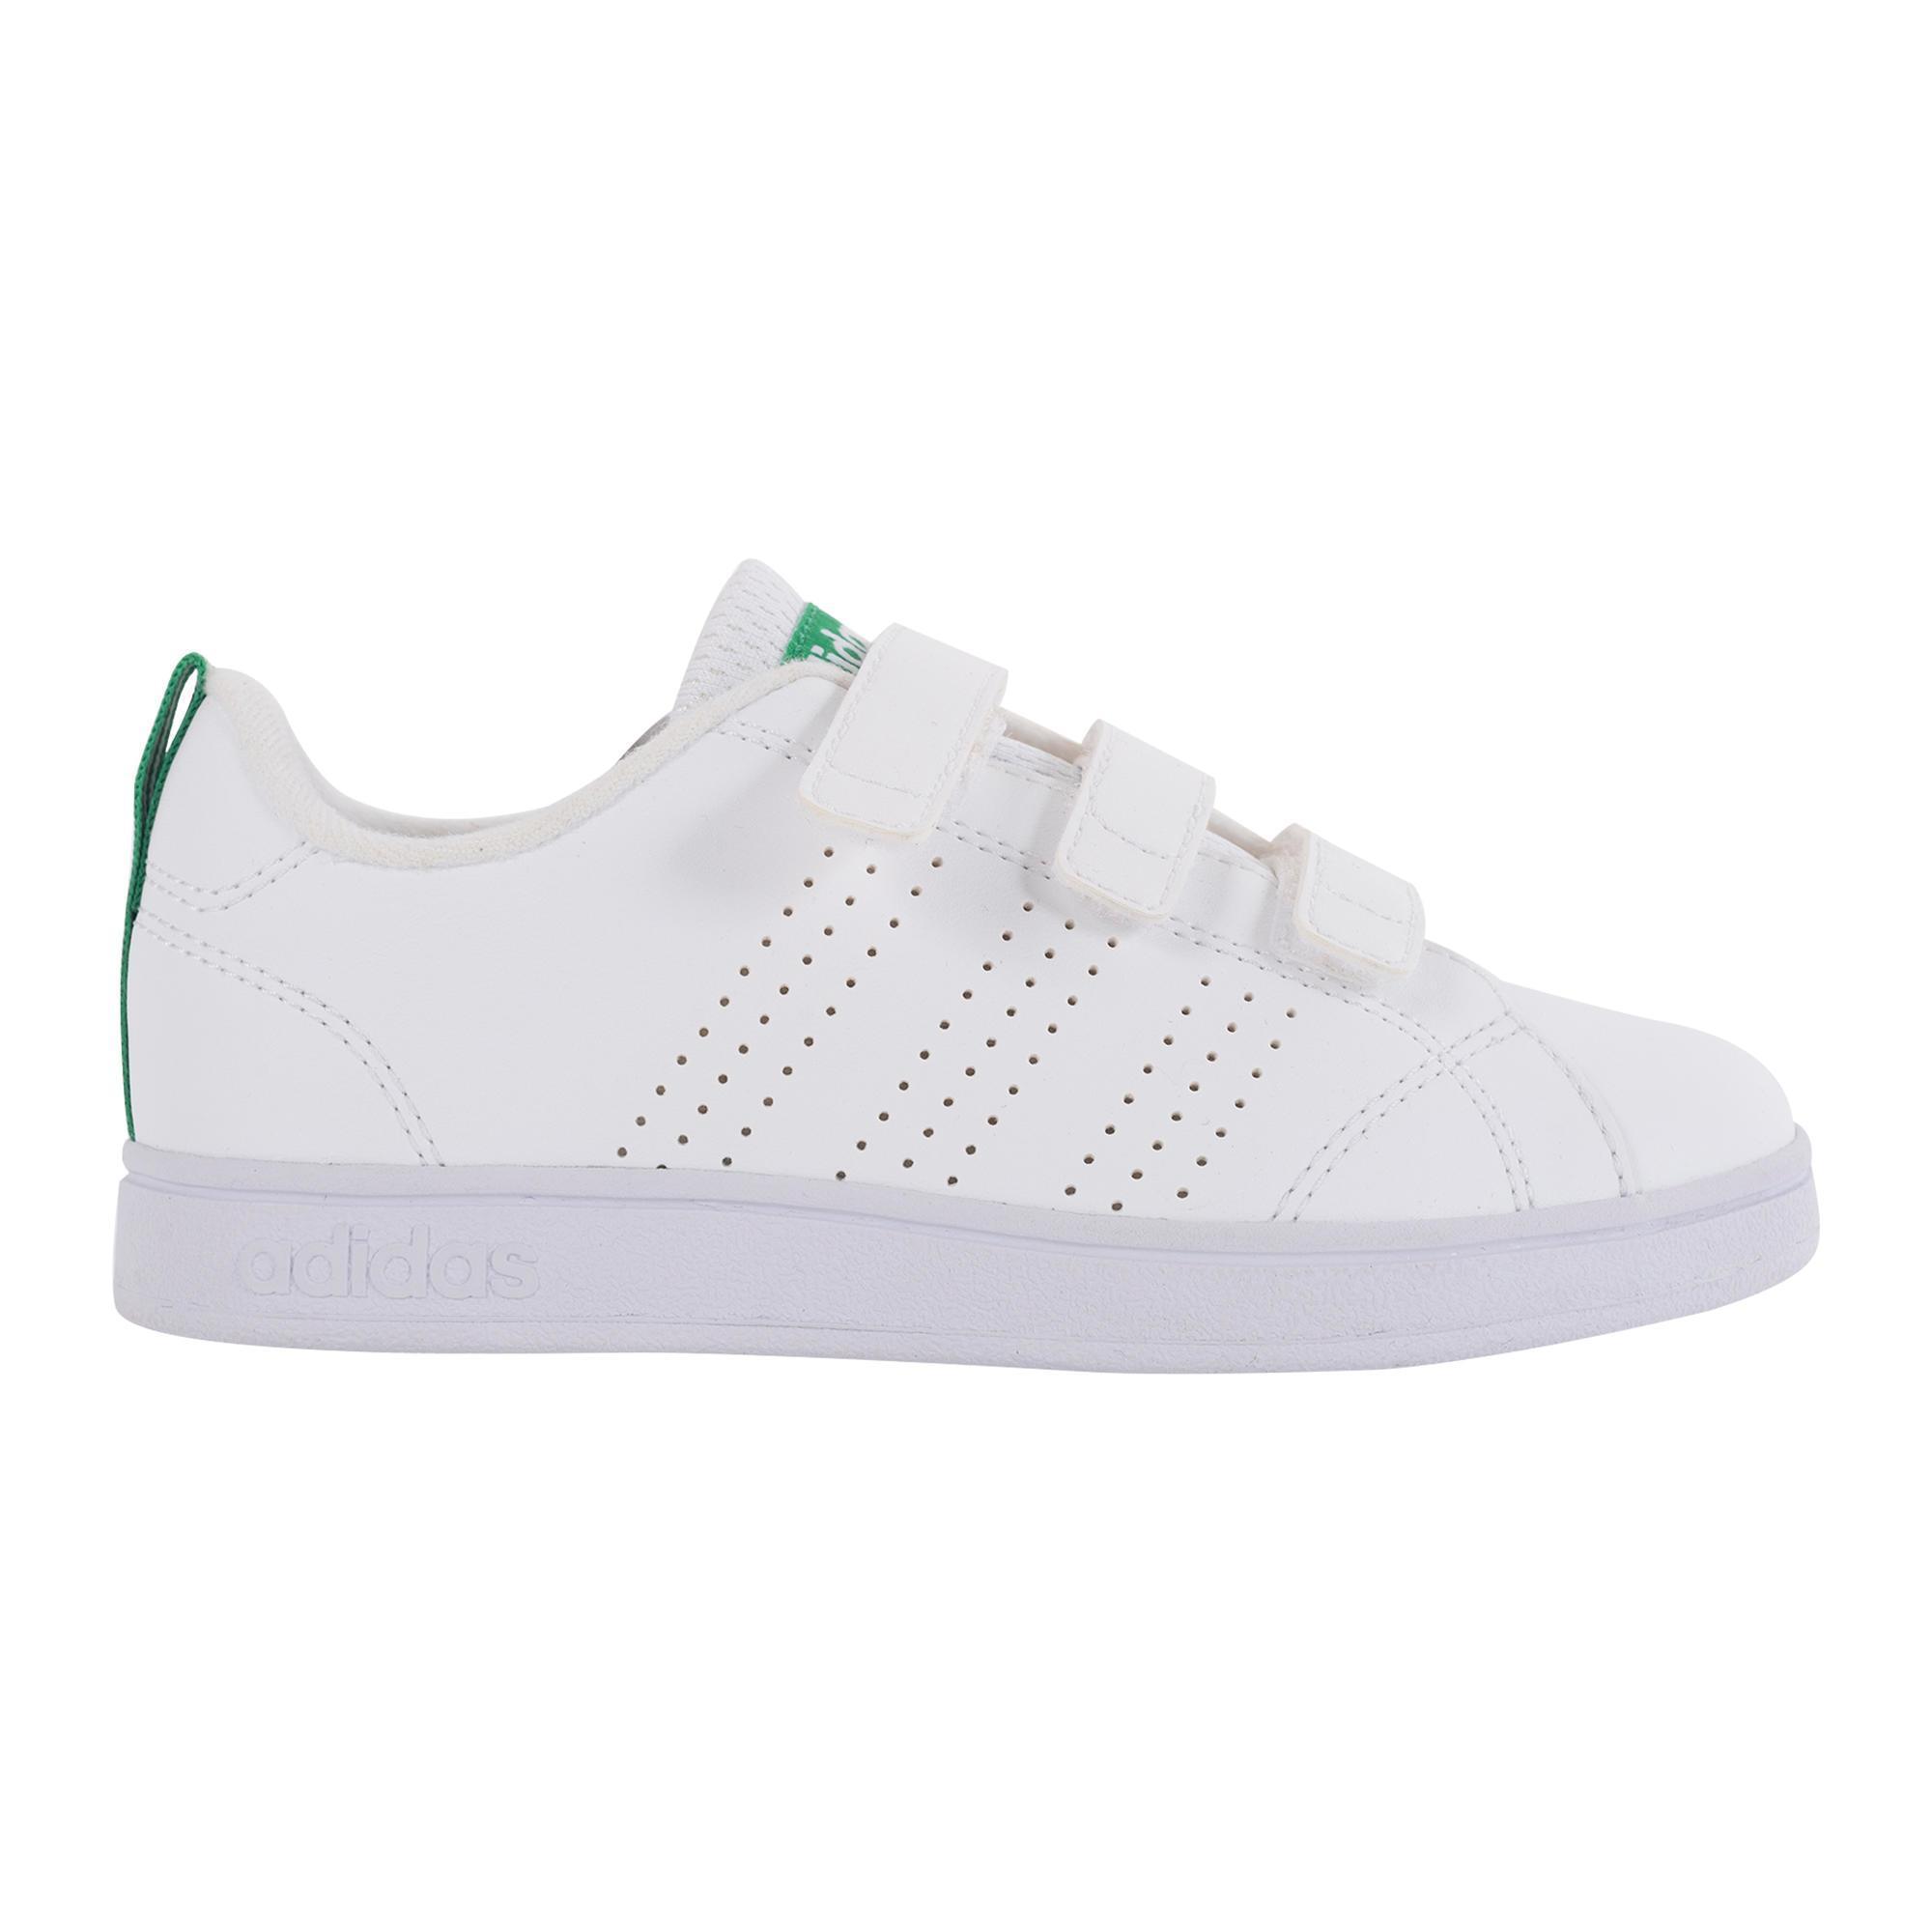 Blanc De Chaussures Enfant Advantage Clean Vert Adidas Neo Tennis w4RvZqx7 77d138ac9643d